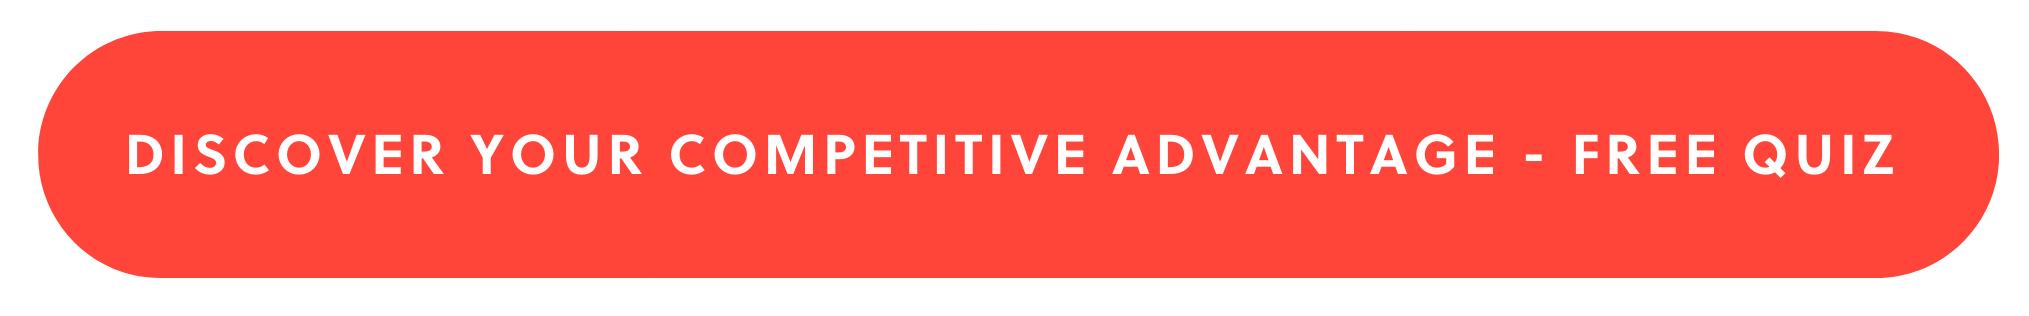 Discover your competitive advantage - free quiz